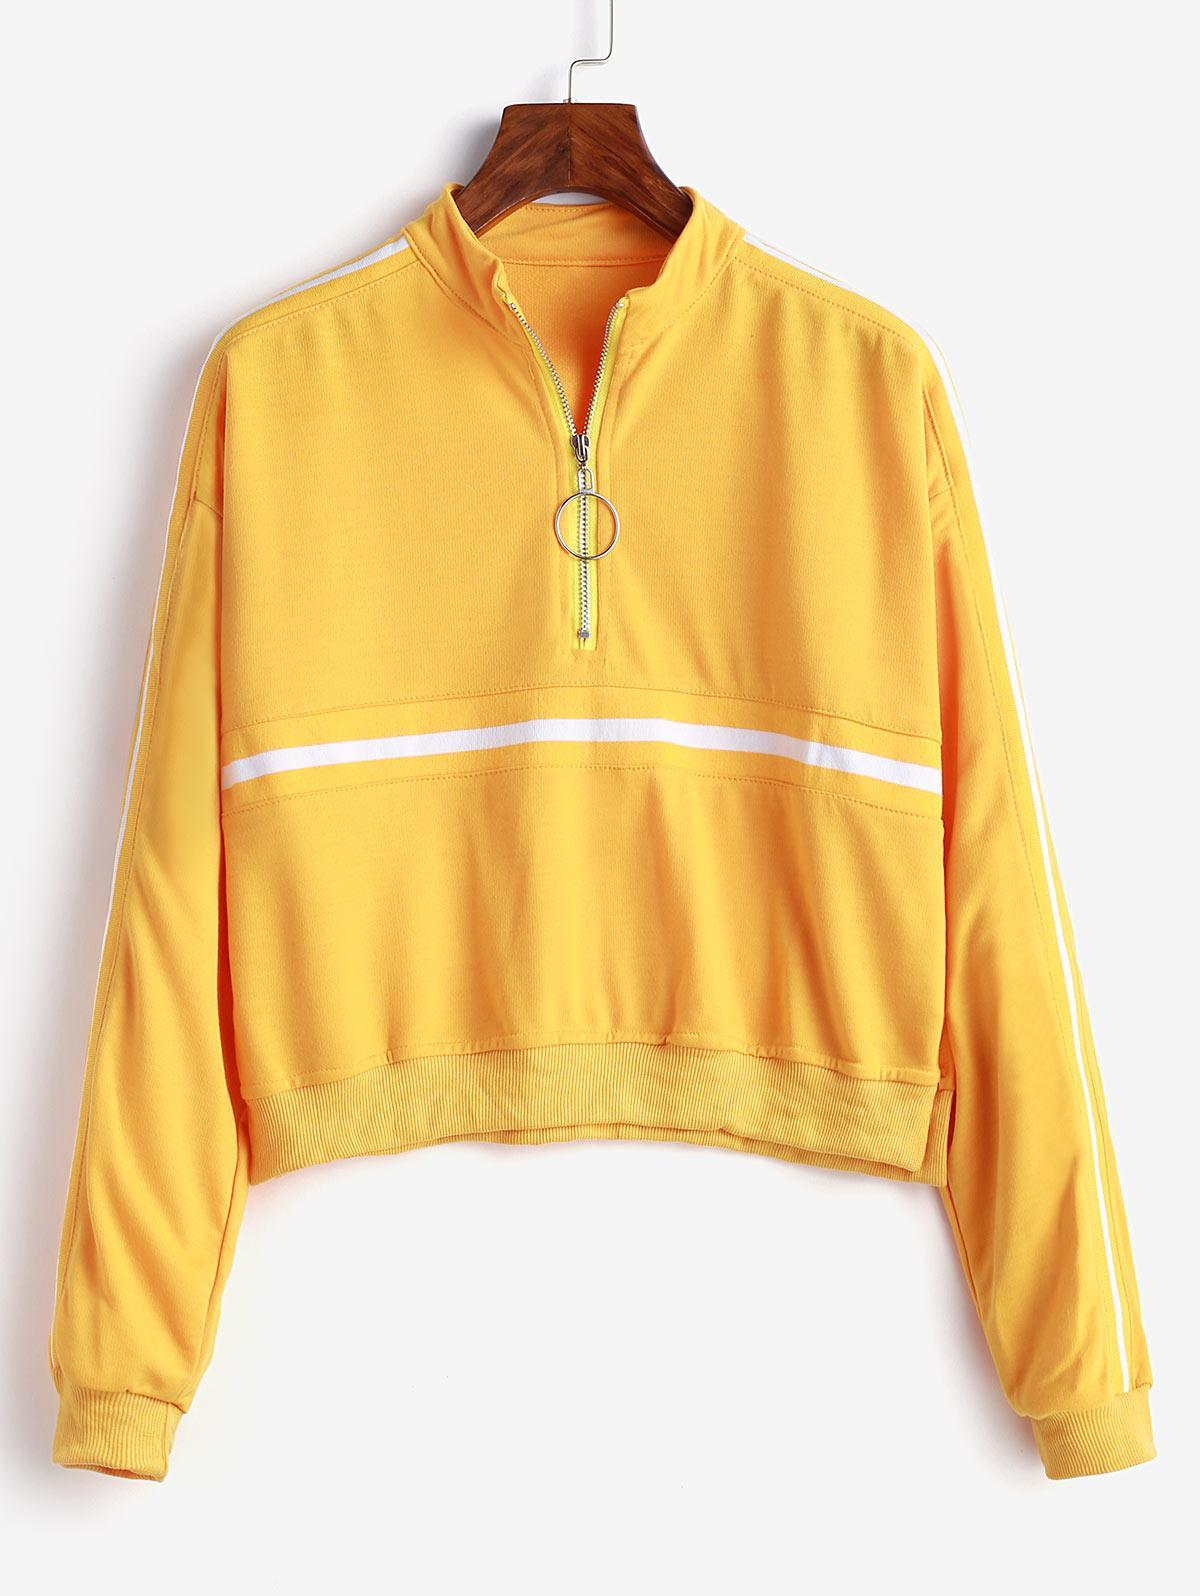 Pull Ring Zip Tape Drop Shoulder Sweatshirt фото